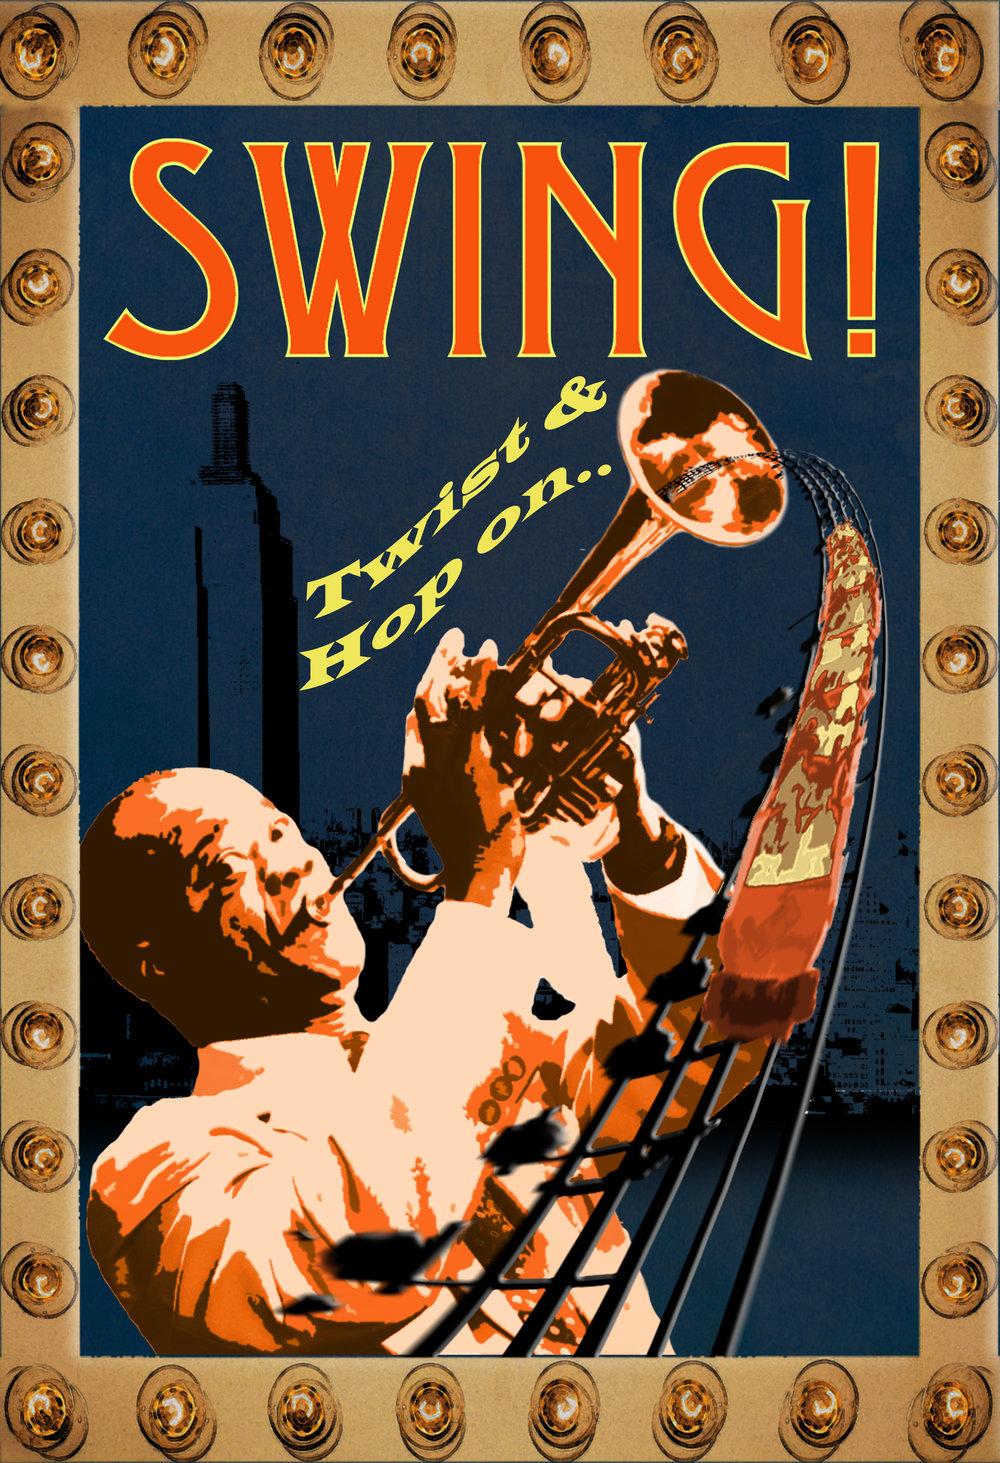 Swingposter.jpg